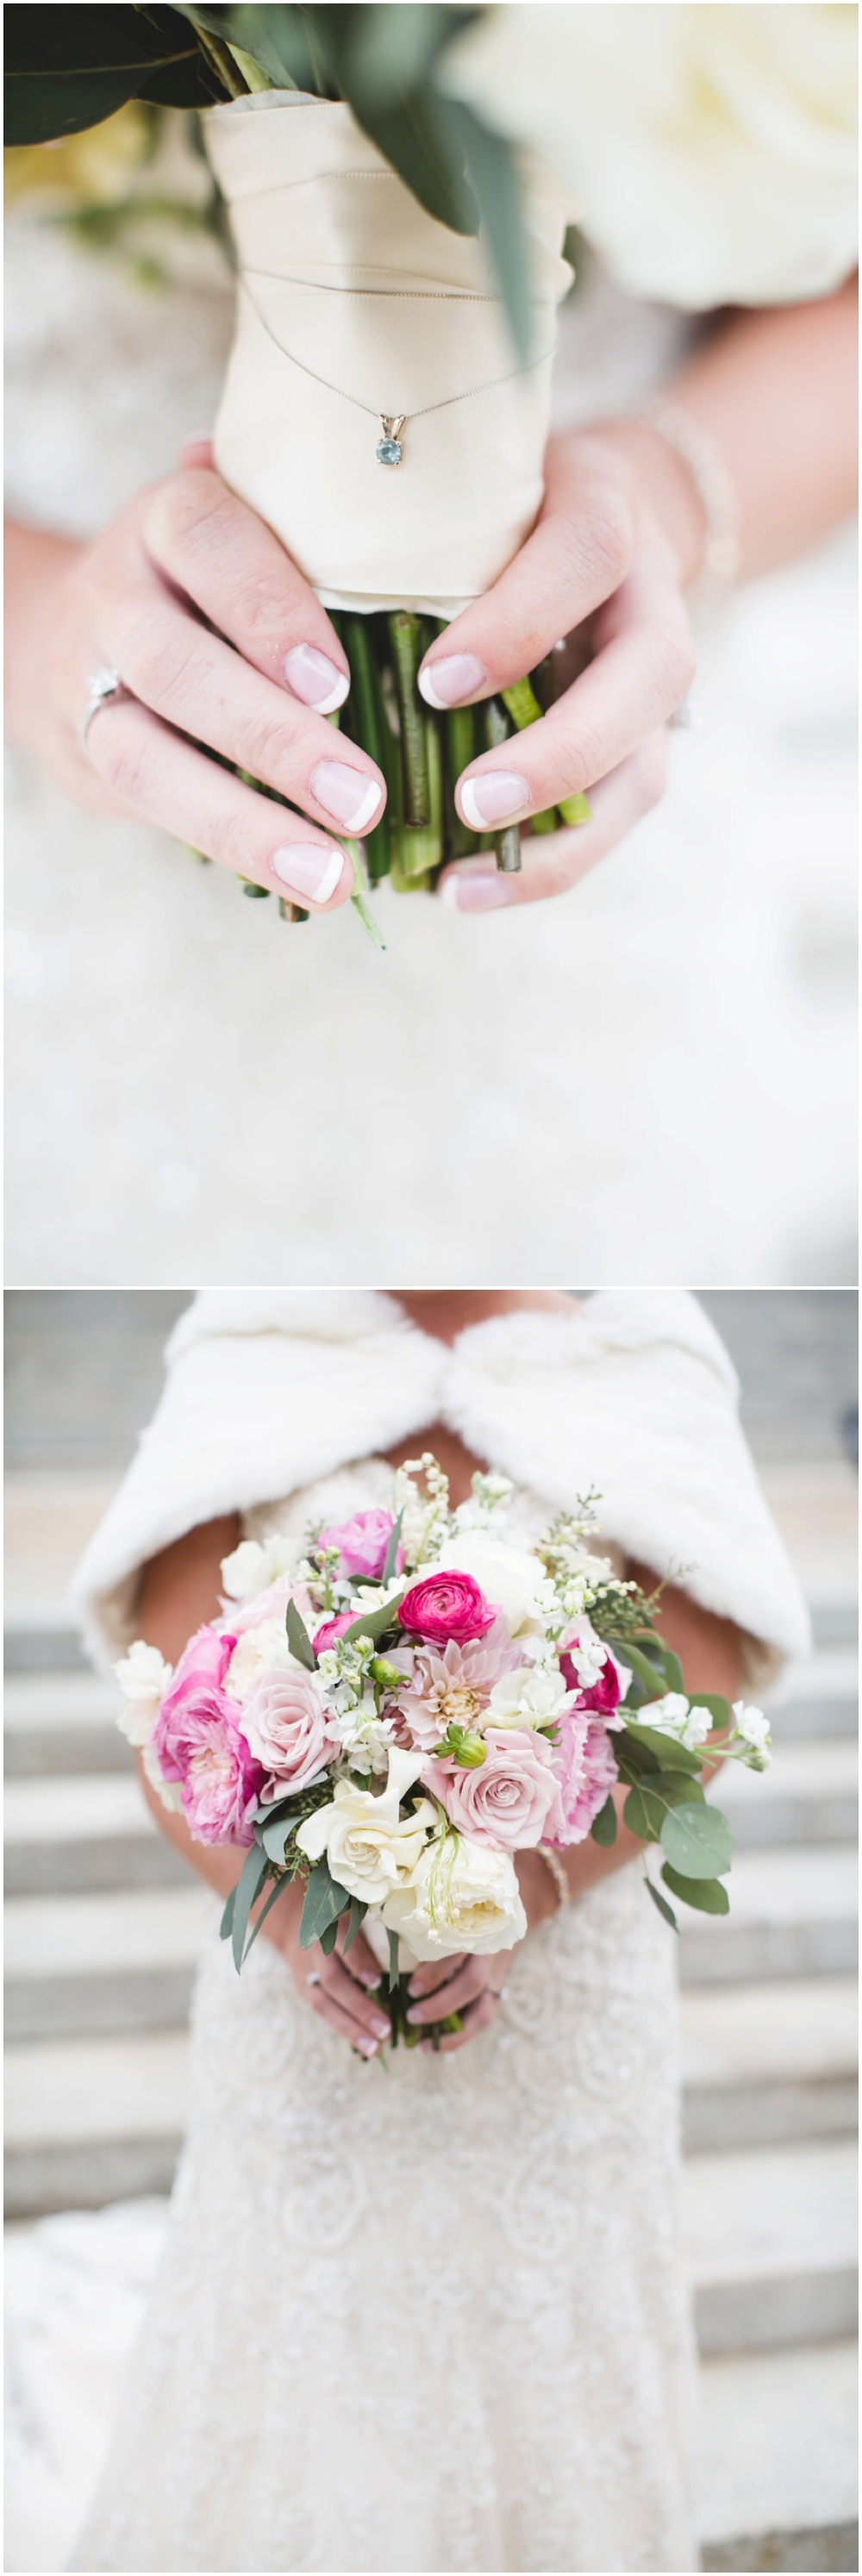 bestweddingphotographystlouis7.jpg